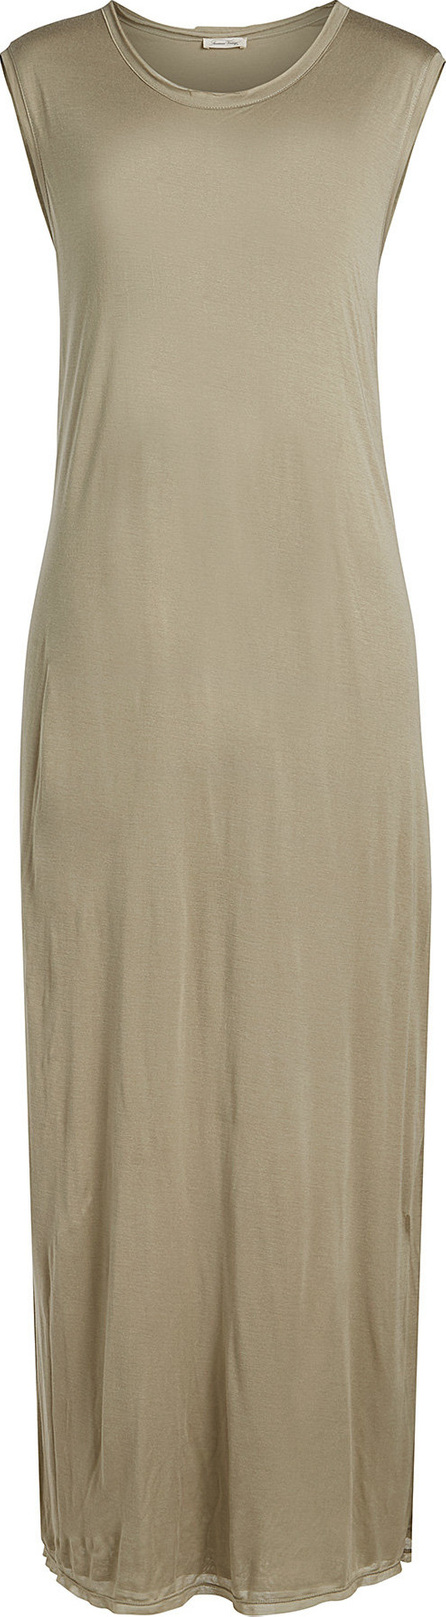 American Vintage Jersey Maxi Dress